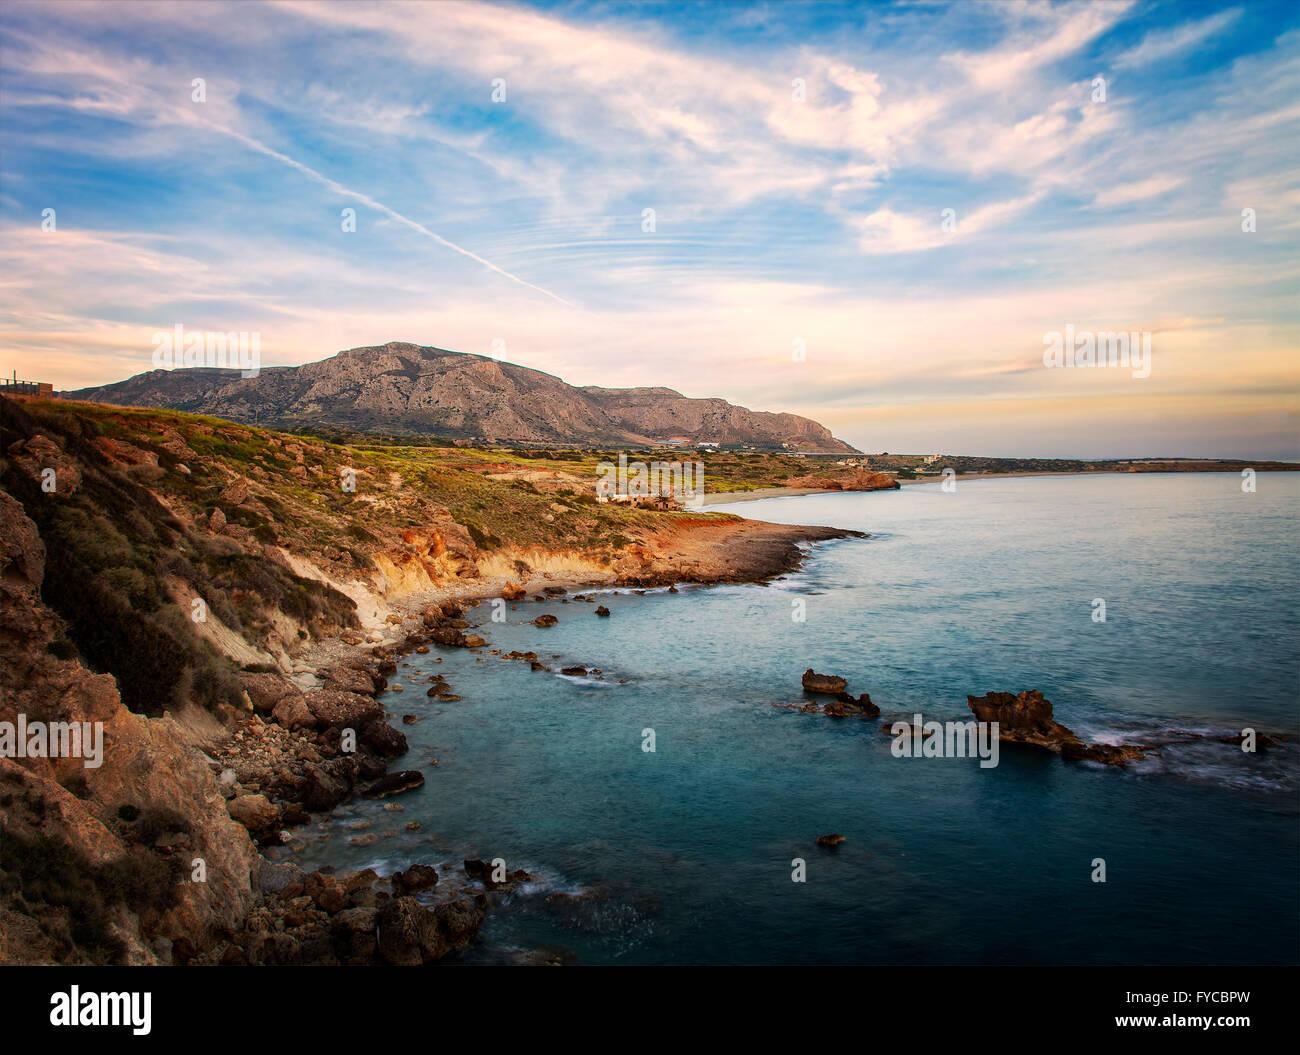 Image of castline on the island of Crete in Greece. Stock Photo